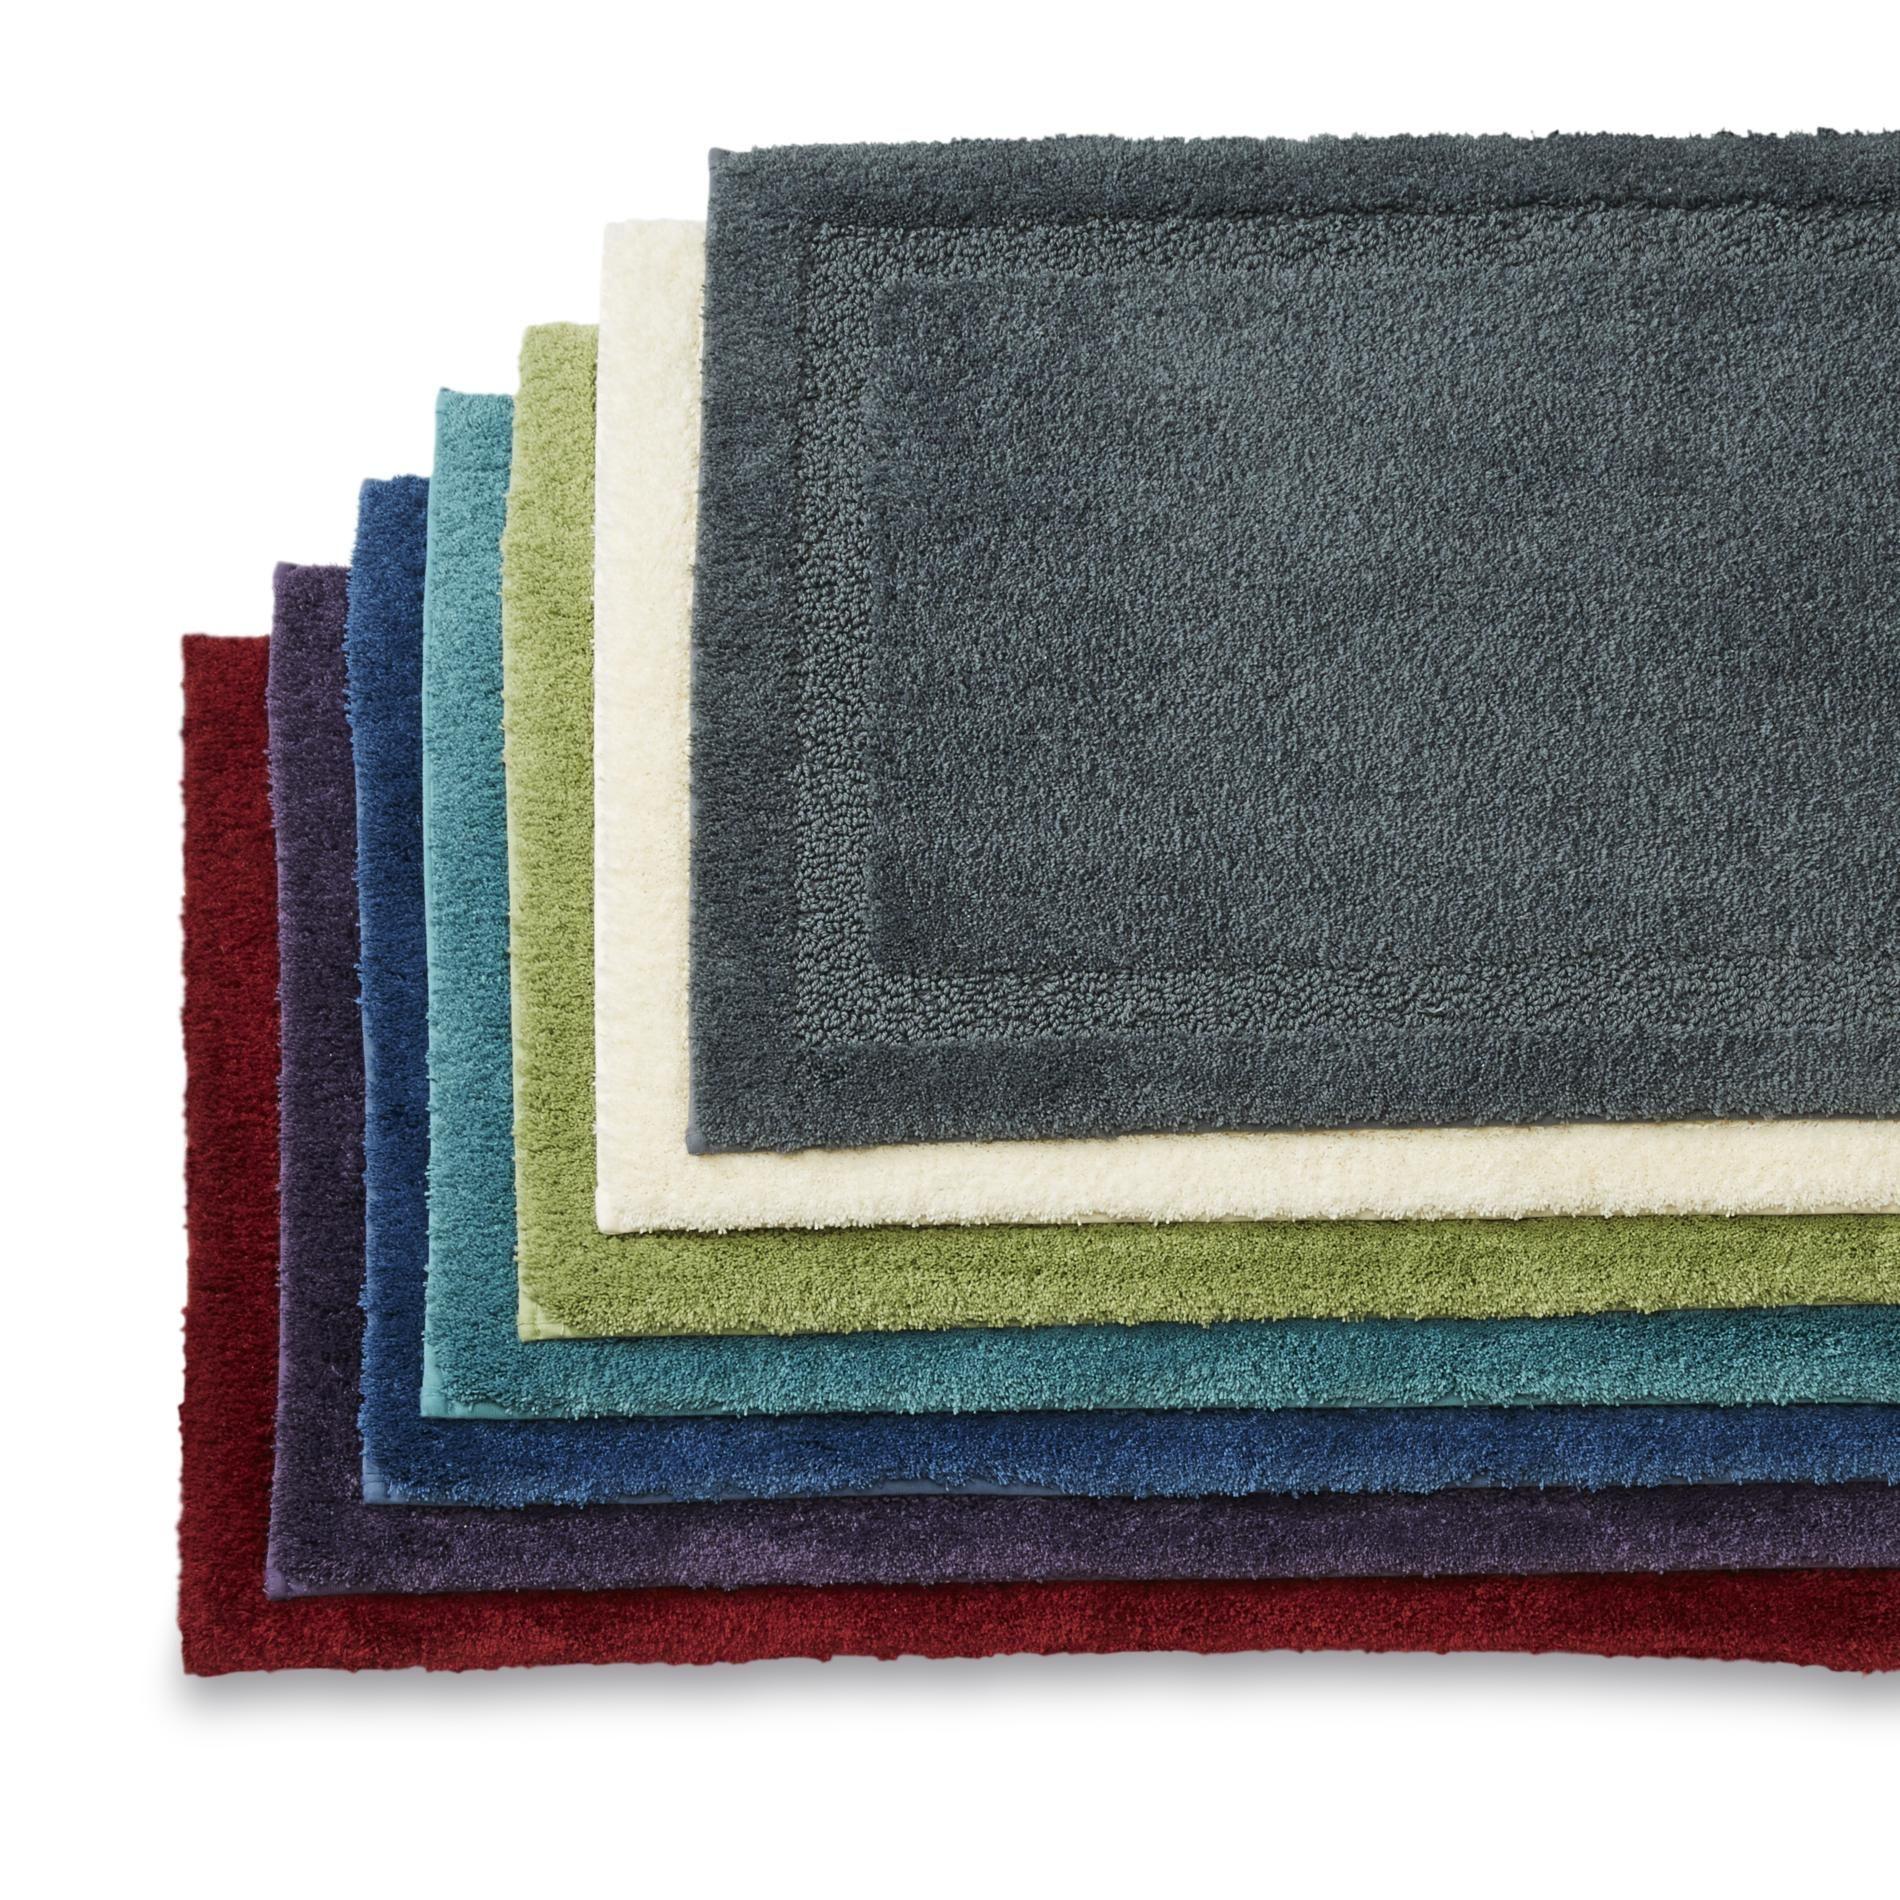 Sears Com Contour Rug Bath Rug Plush Bath Rugs [ 1900 x 1900 Pixel ]